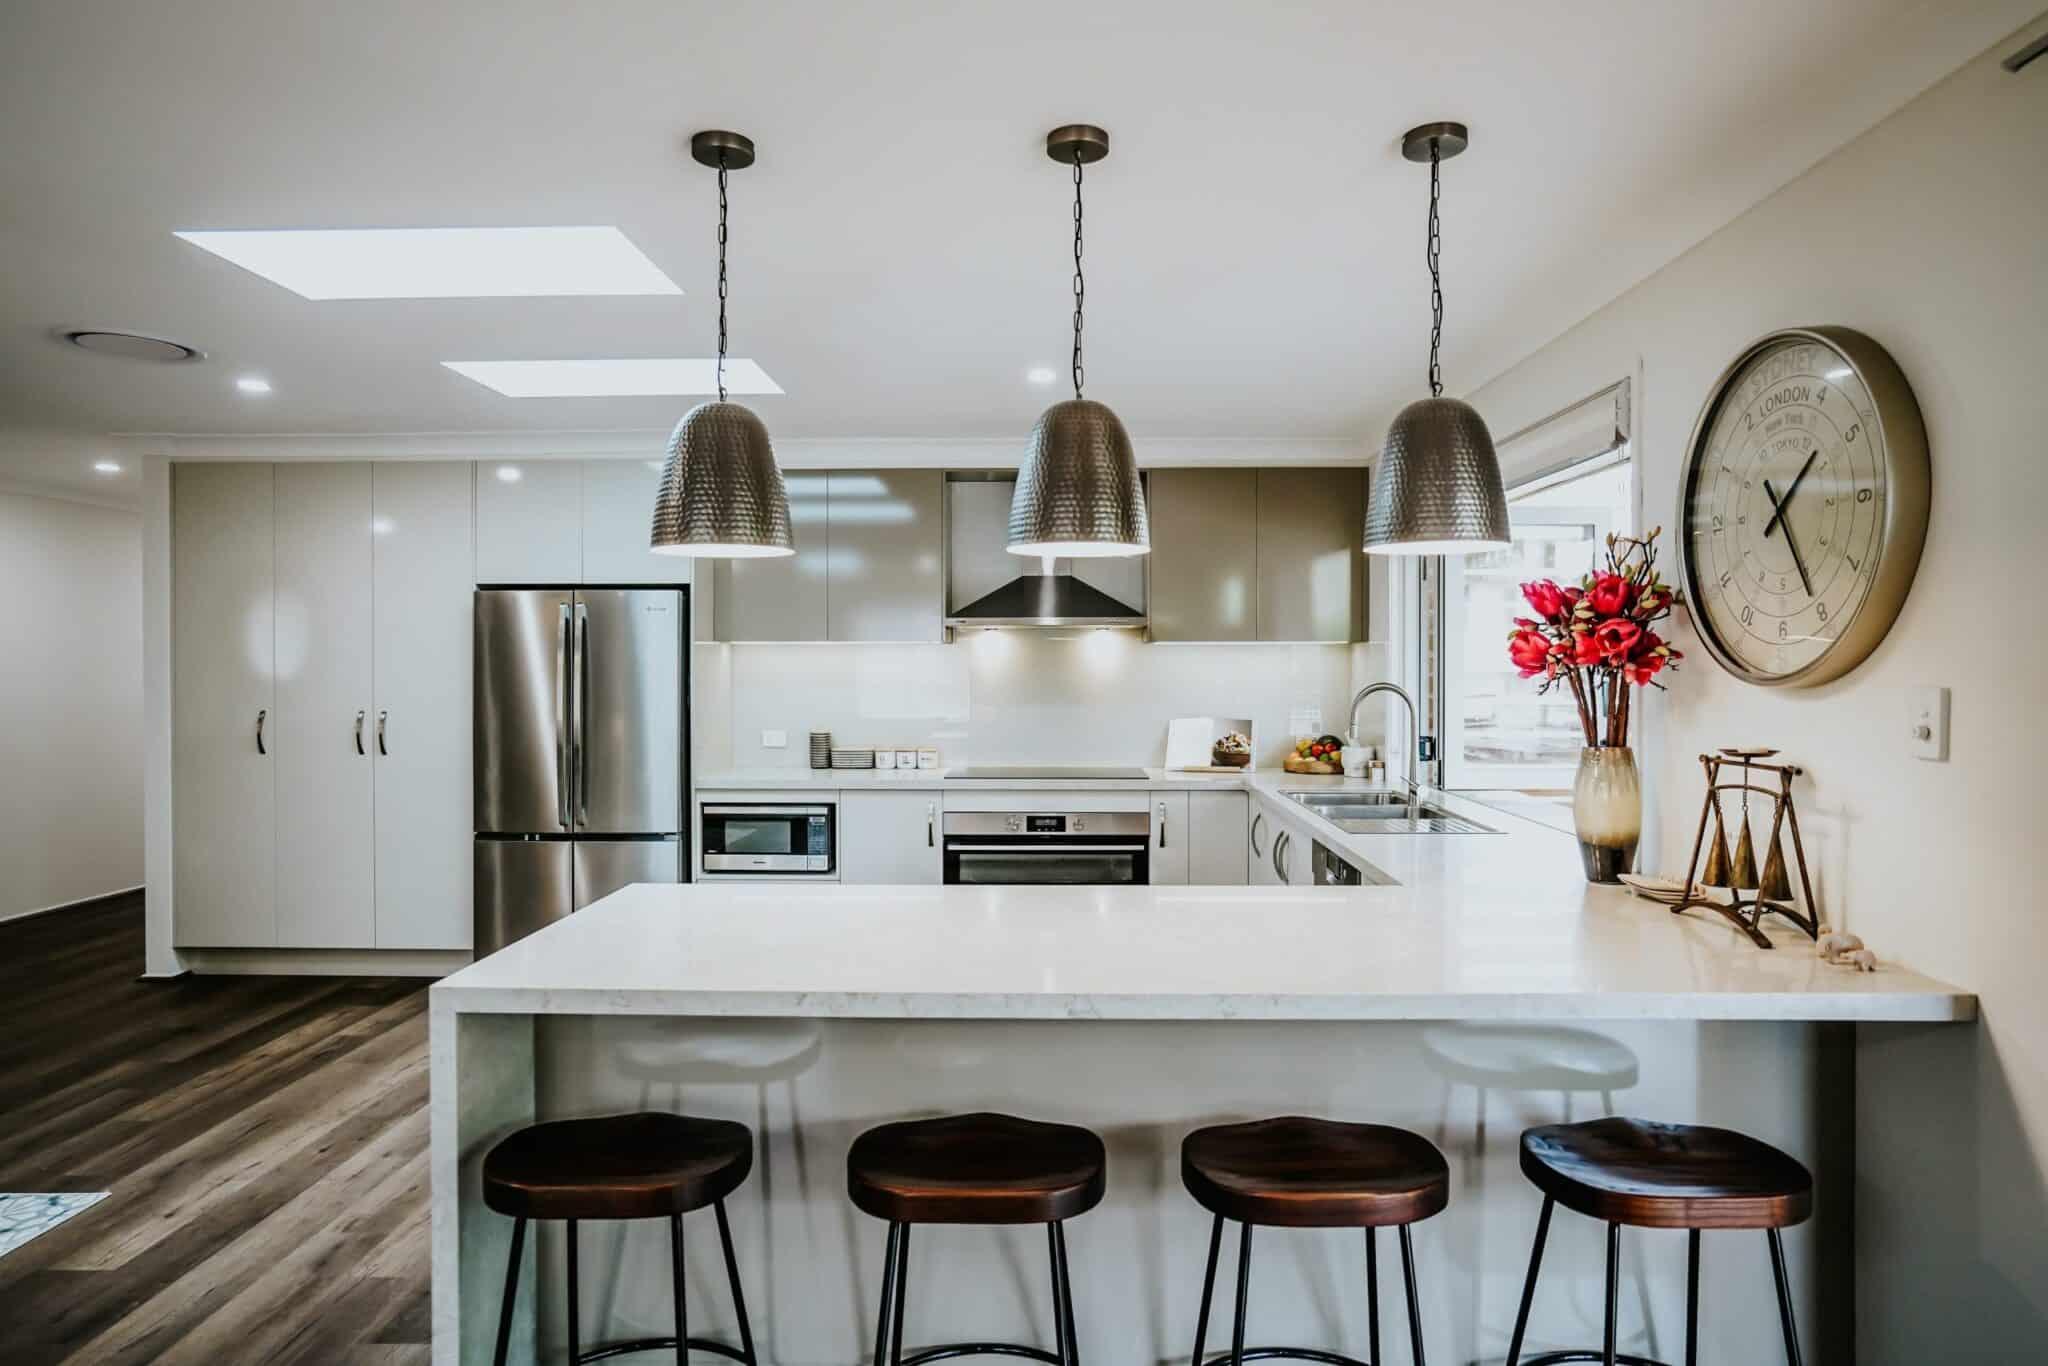 Locspec Building Shell Cove Renovation - Kitchen